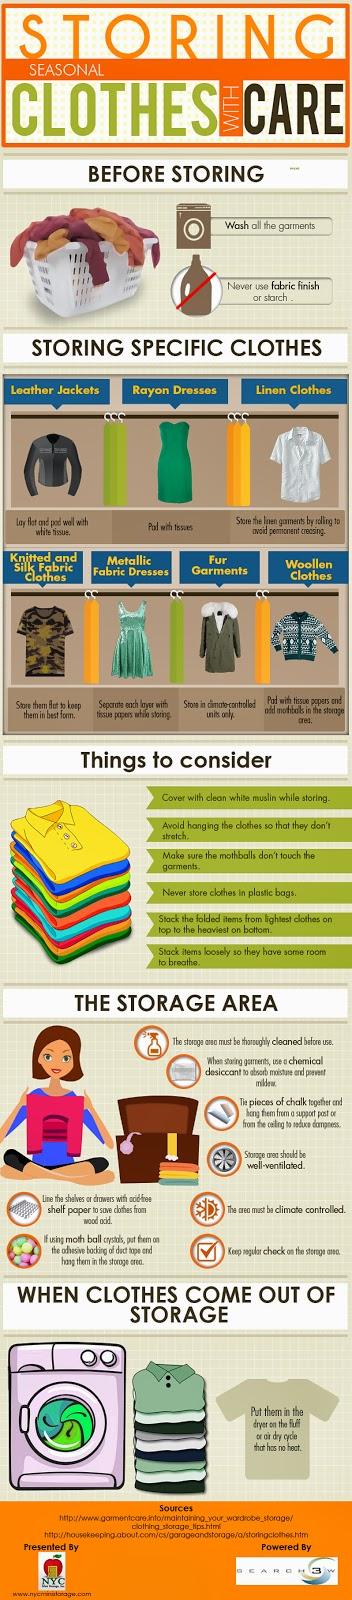 Storing Seasonal Clothes With Care Storage Ny Nyc Mini